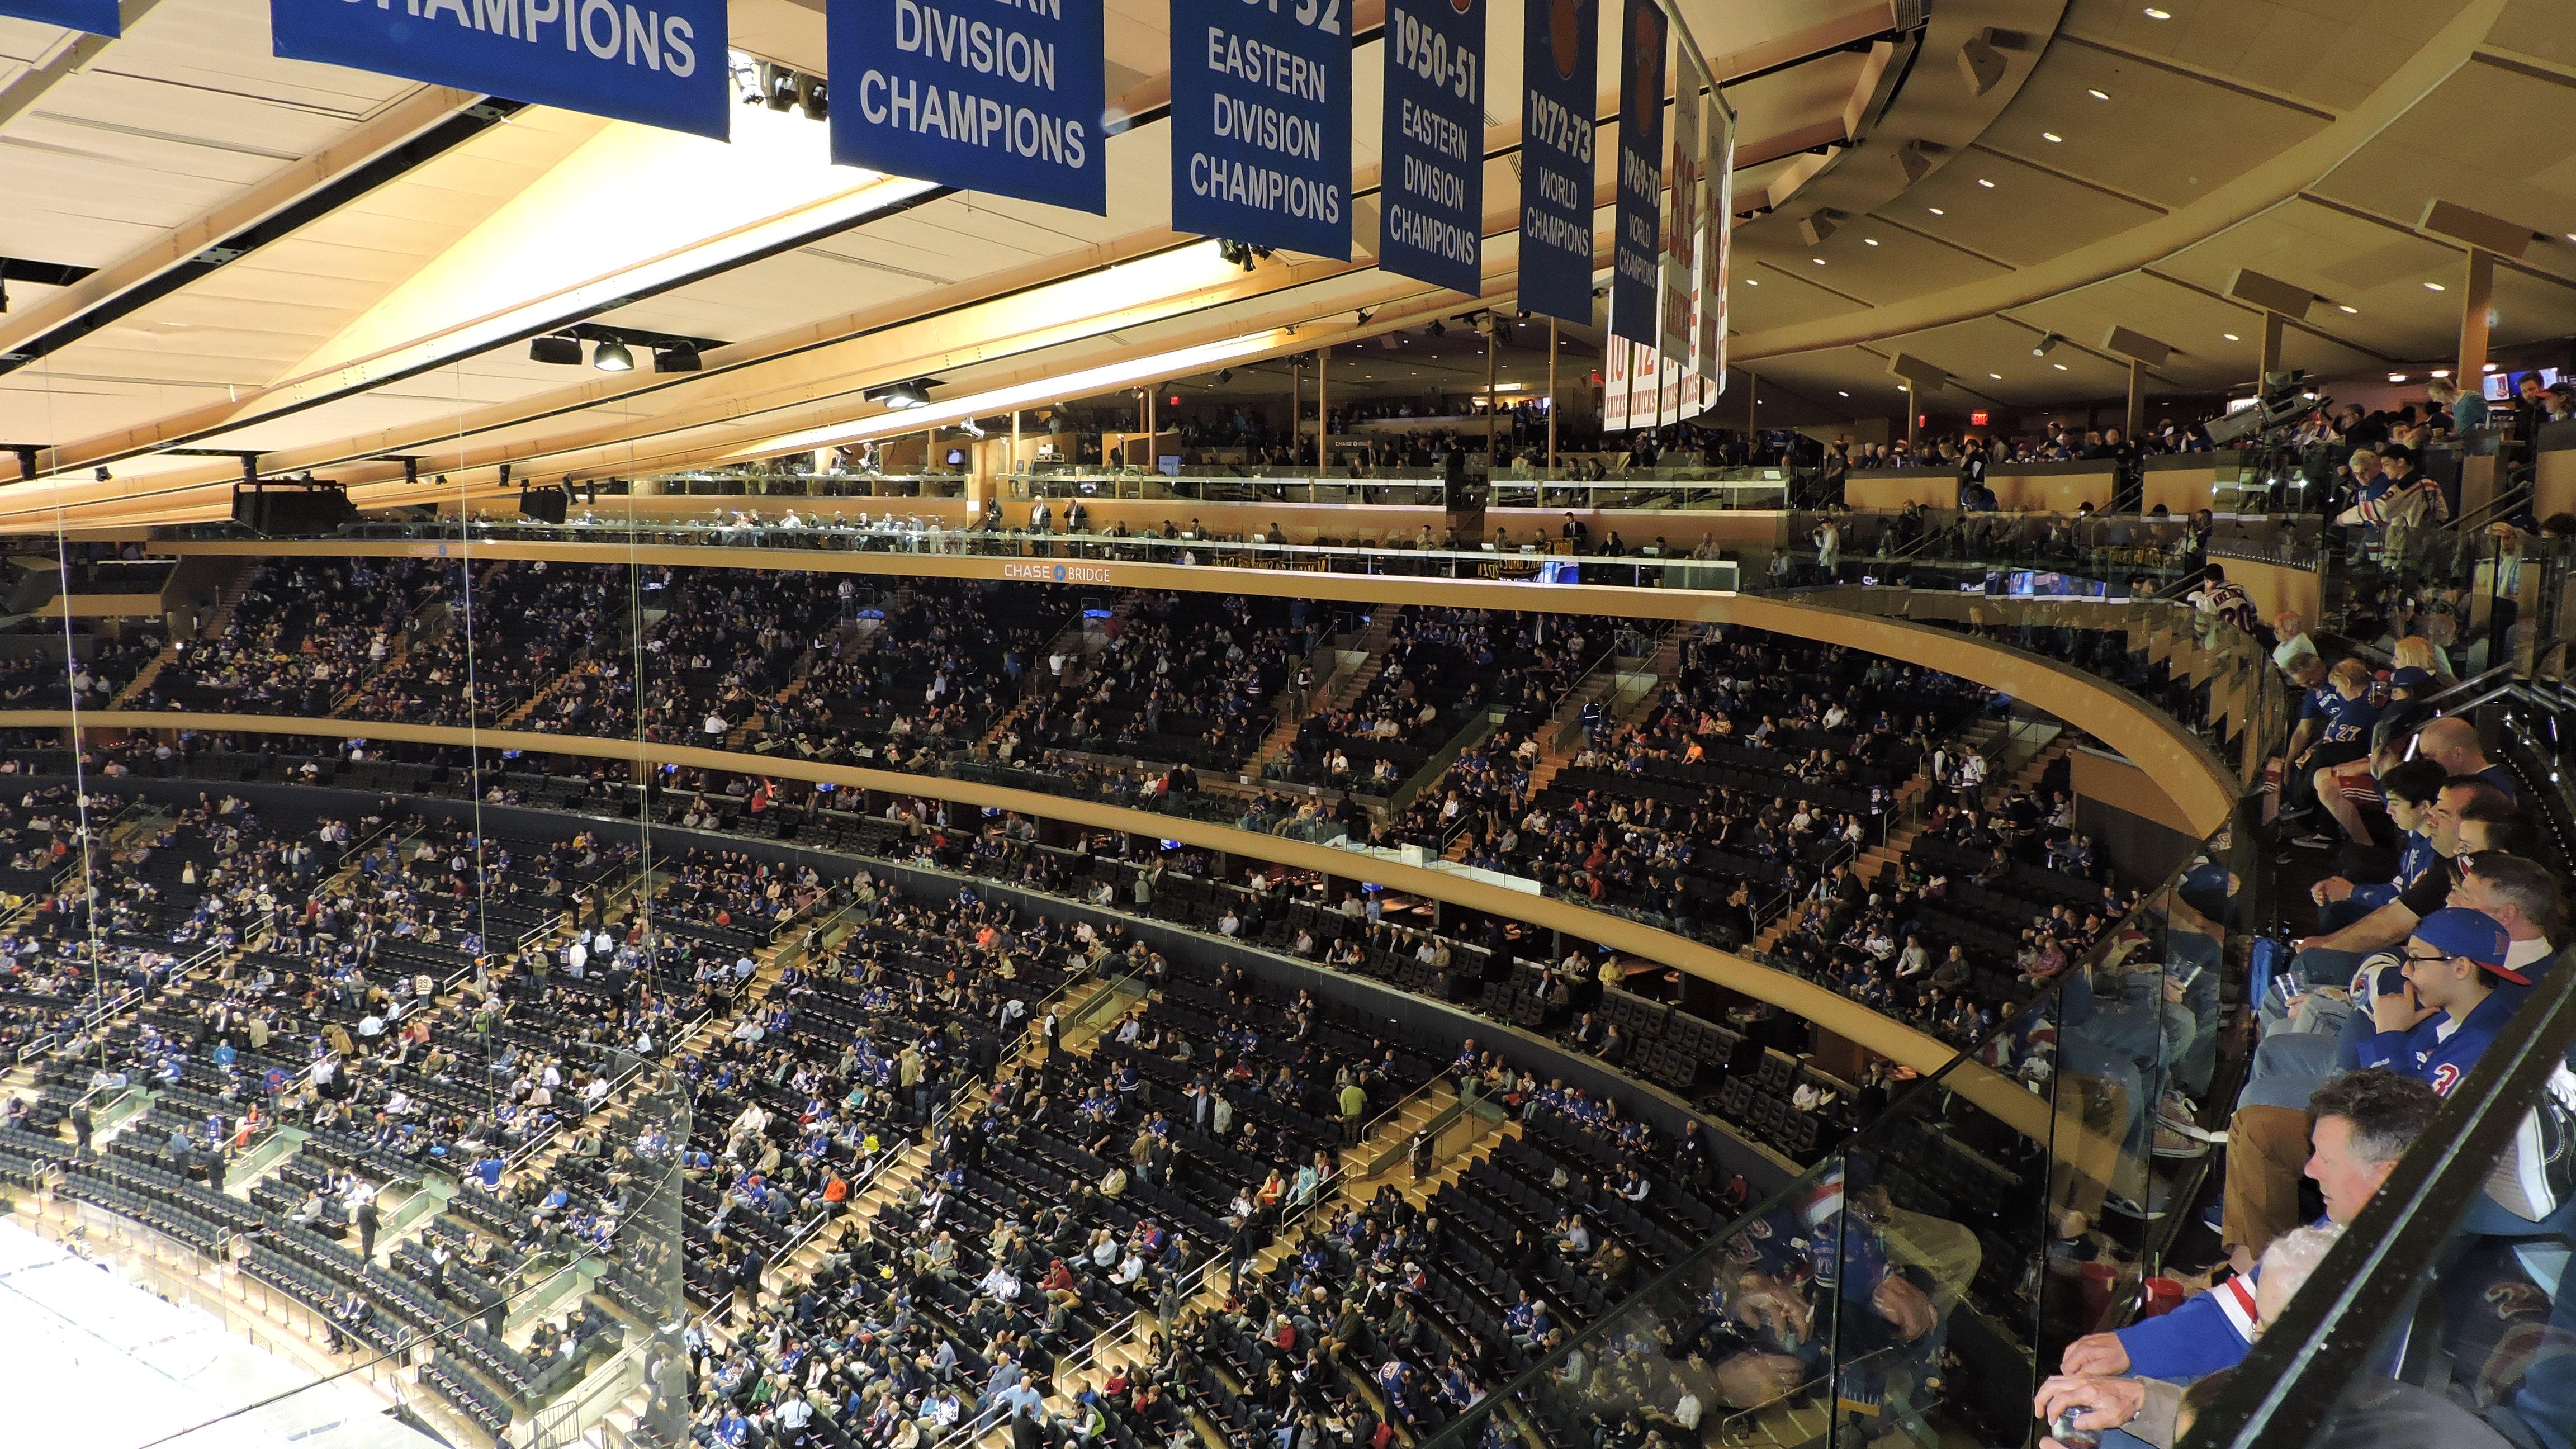 Madison Square Garden Stadium And Arena Visits